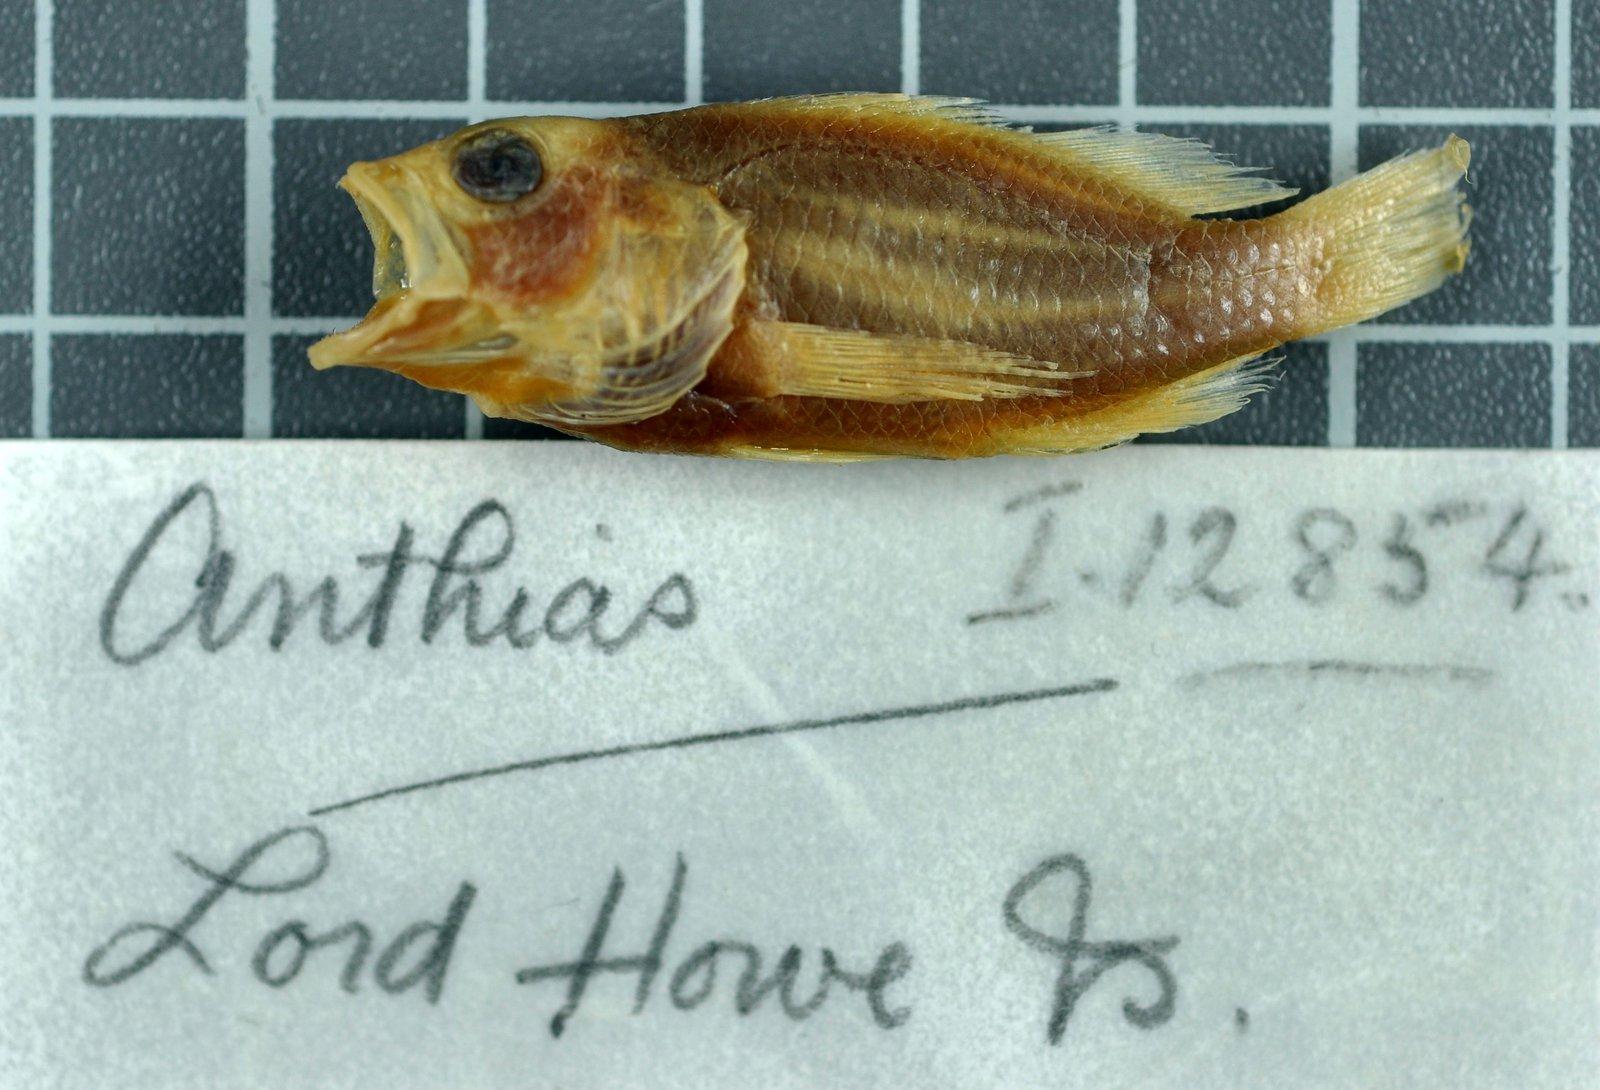 Plectranthias cruentus, AMS I.12854, 43.0 mm SL, Australia, Lord Howe Island, P.R. Pedley, 1913.